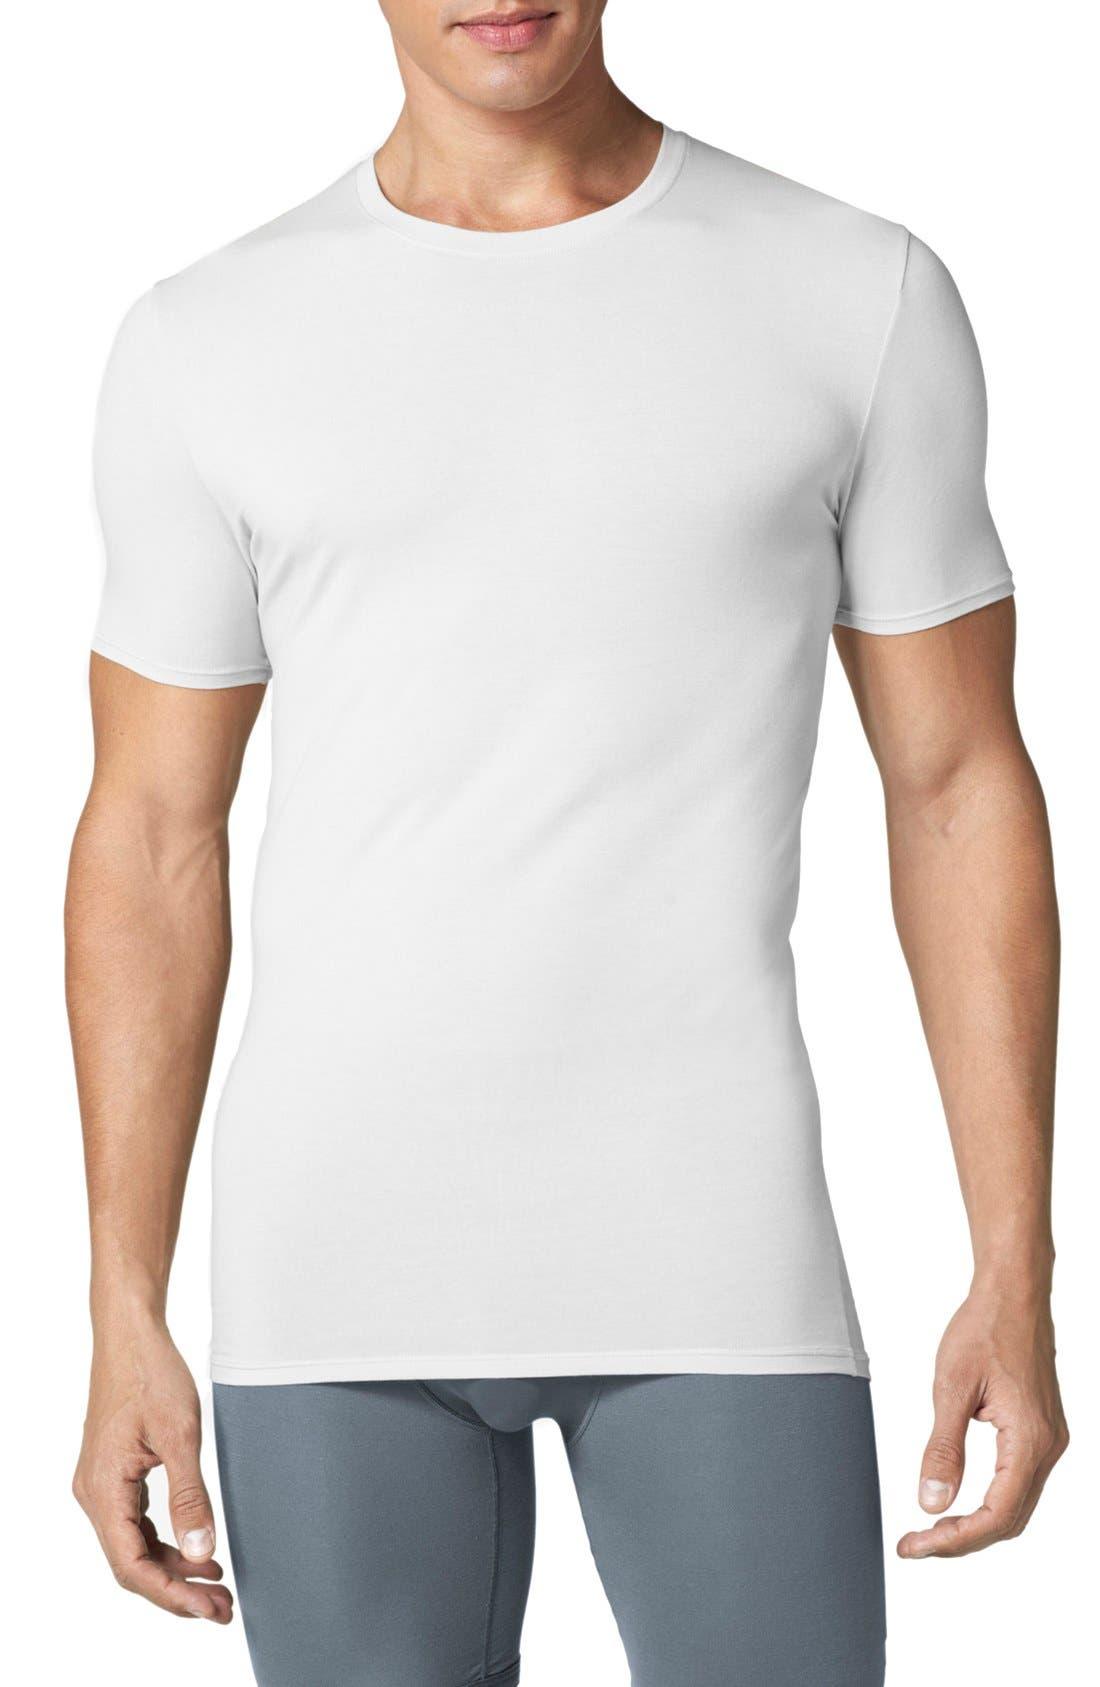 Alternate Image 1 Selected - Tommy John 'Second Skin' Crewneck Undershirt